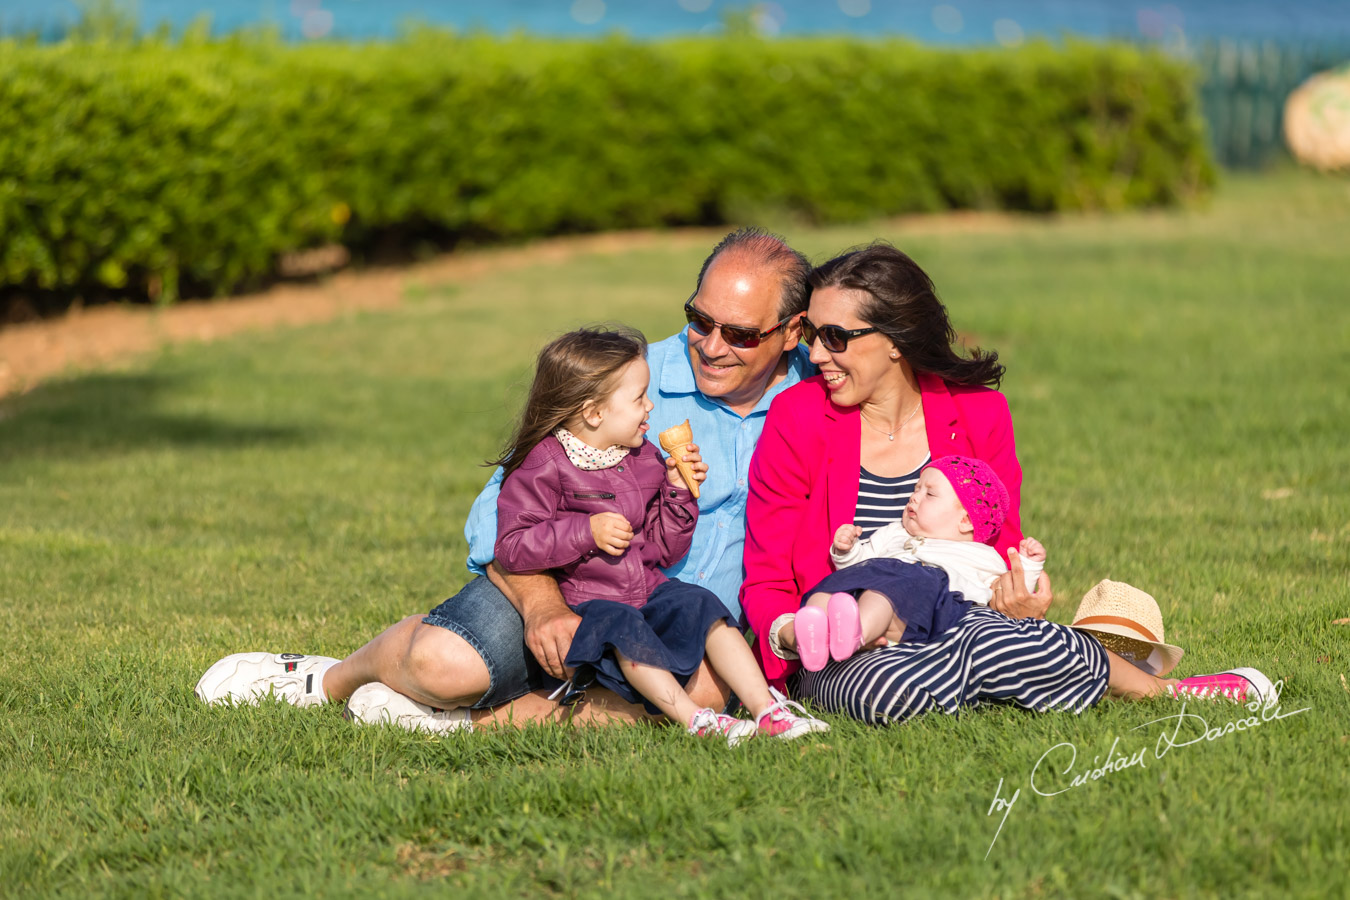 A Family Photo Shoot in Protaras, Cyprus - 20